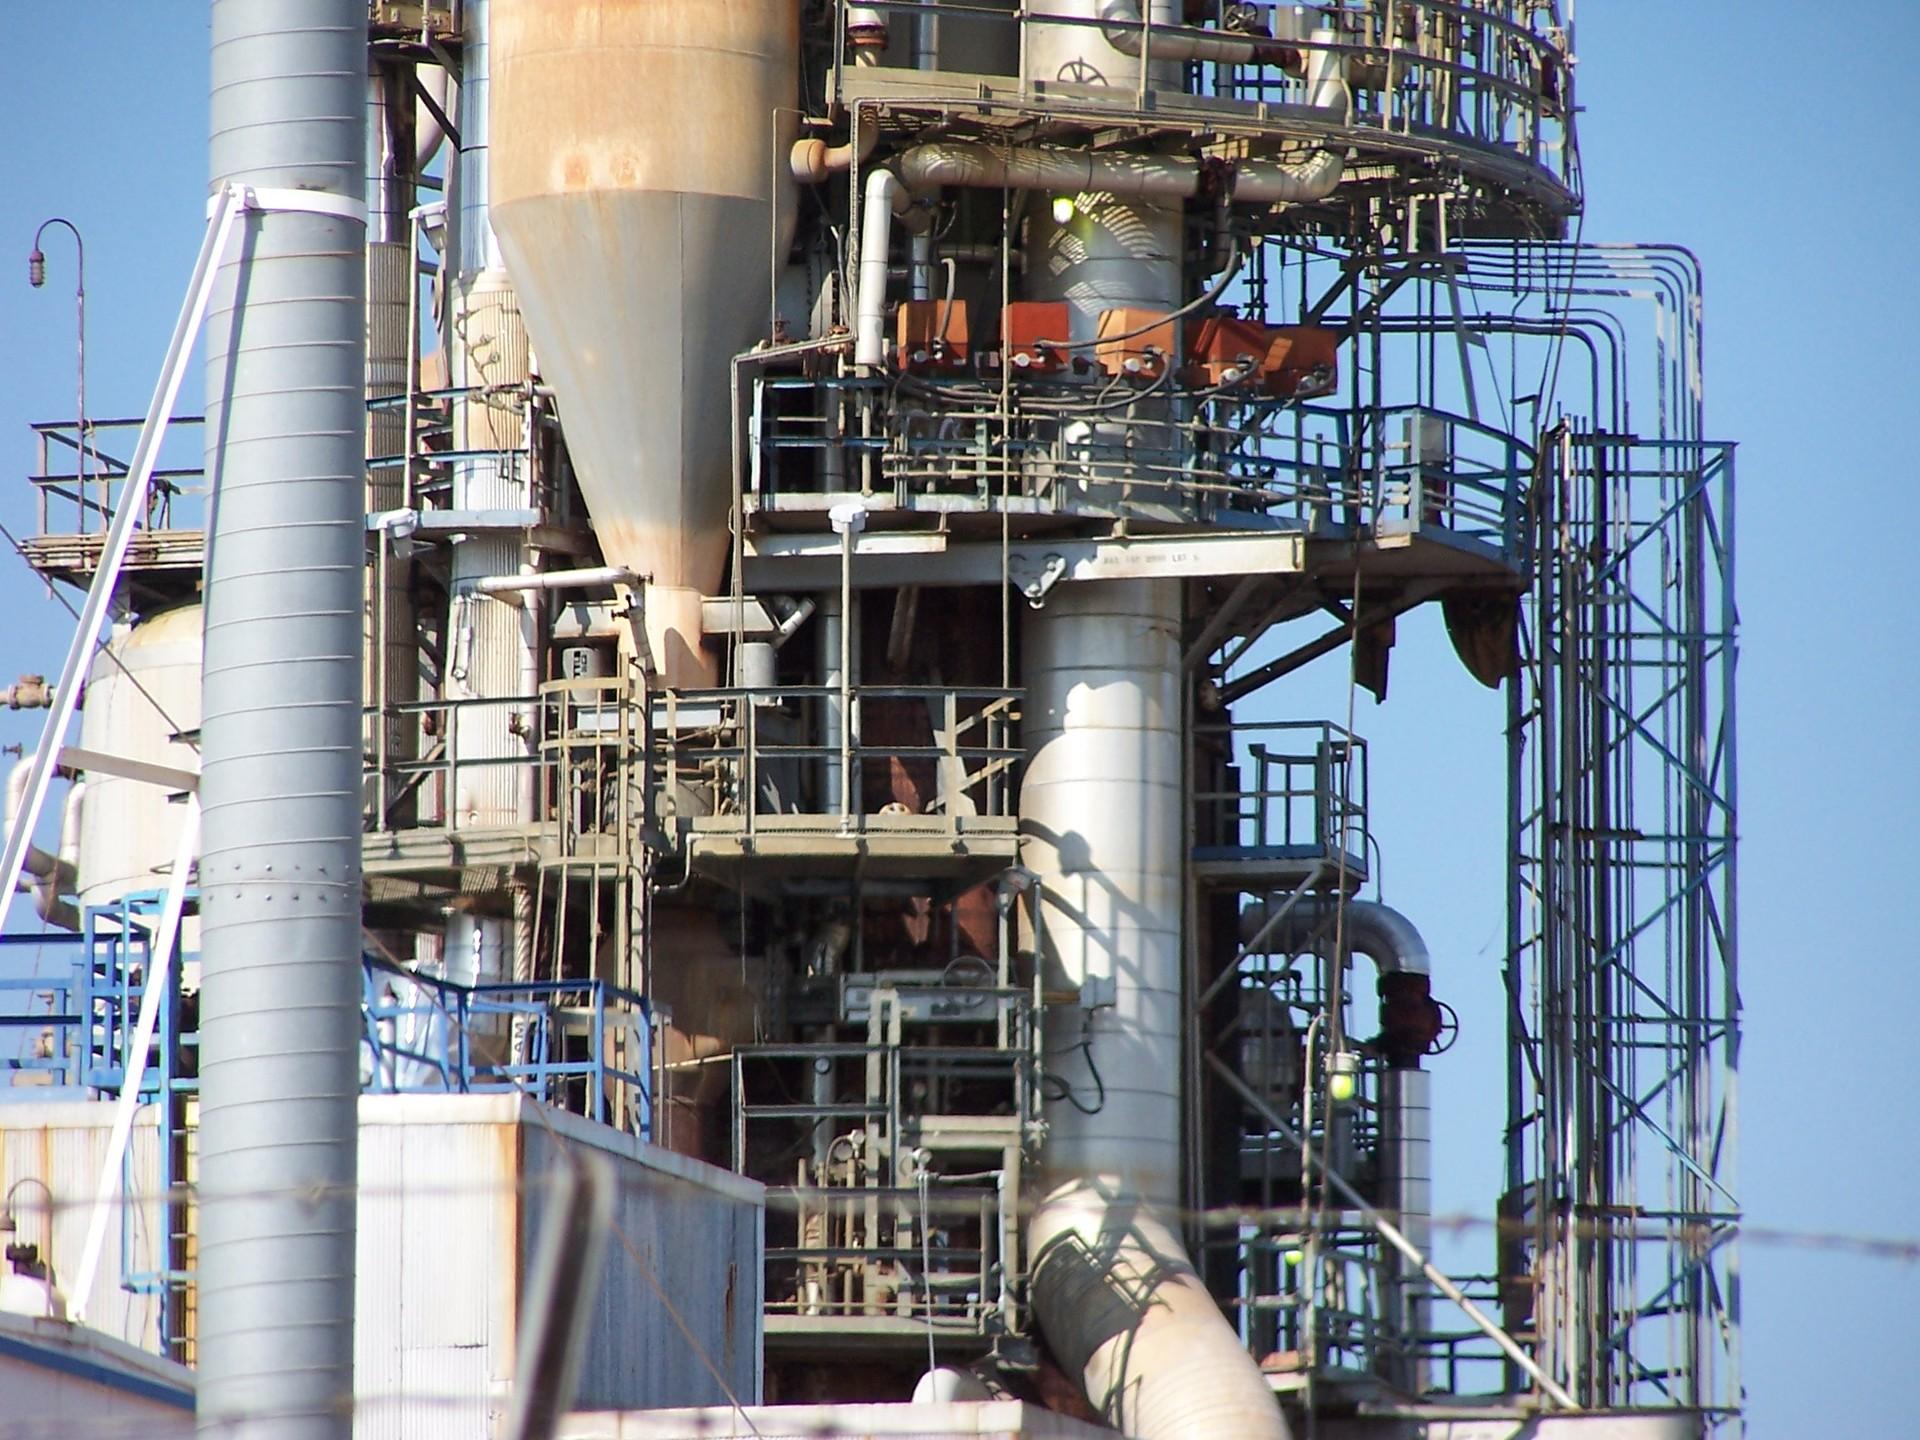 refinery-row-2-1545671-1920×1440